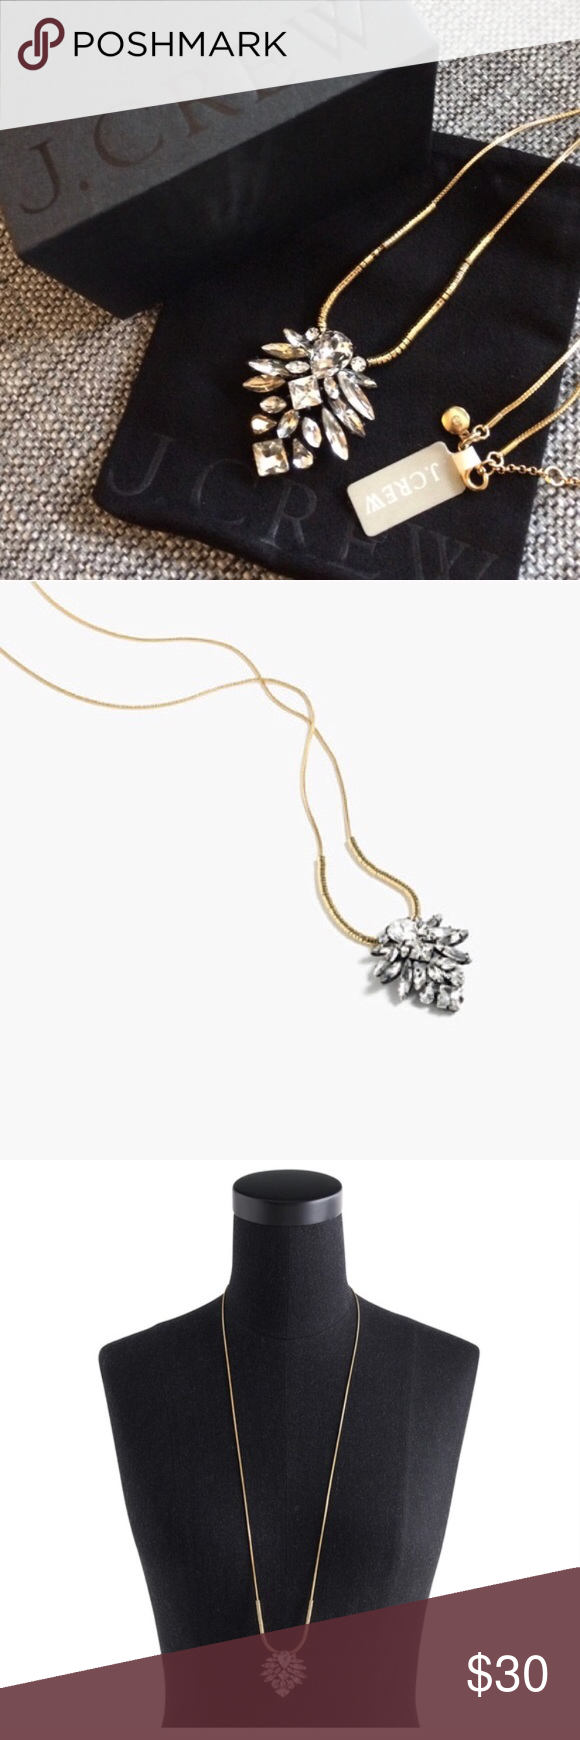 Nwot j crew blooming crystal pendant necklace my posh closet